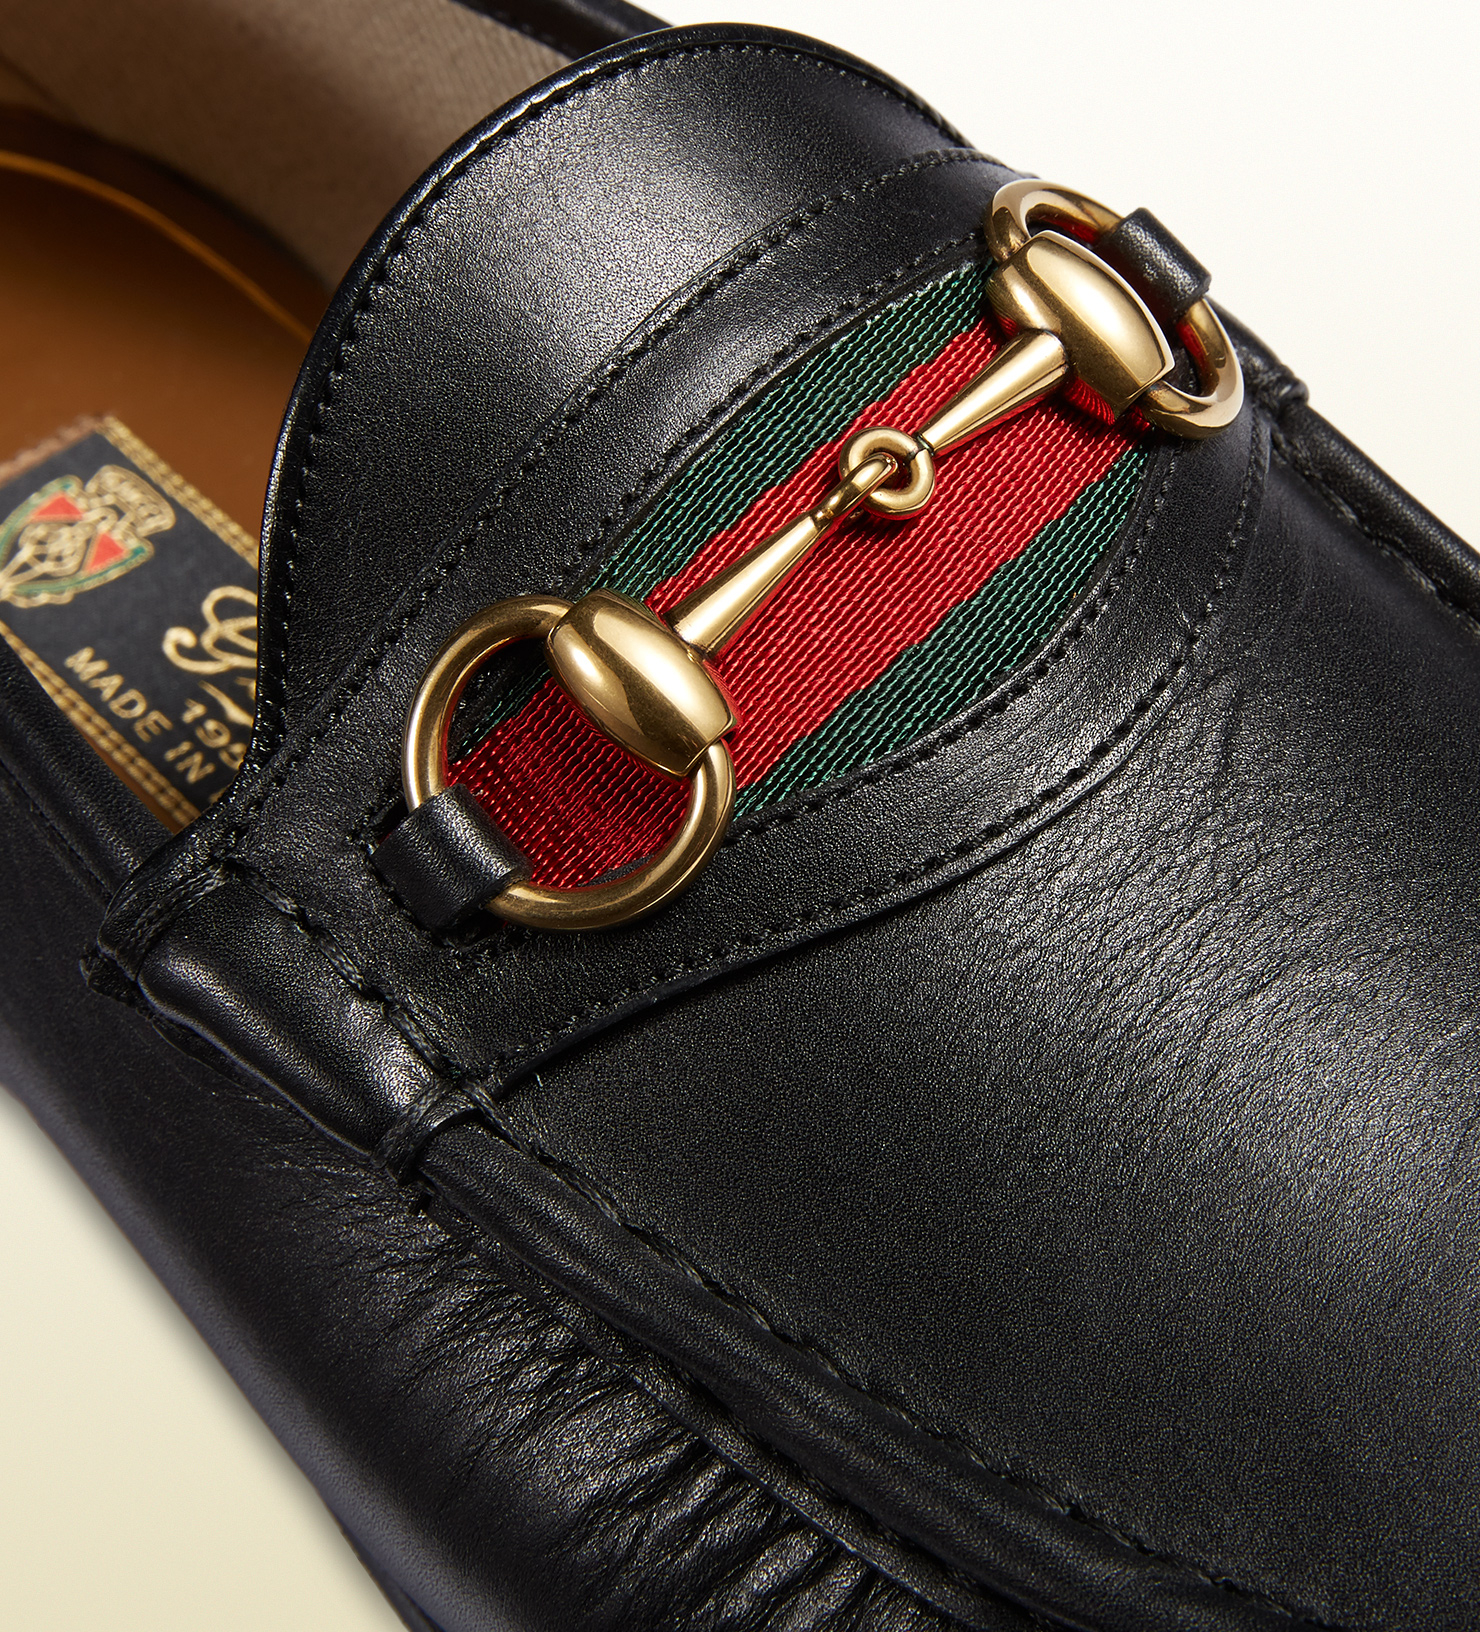 83eb2e79fb7 Lyst - Gucci Men s Leather Horsebit Loafer in Black for Men